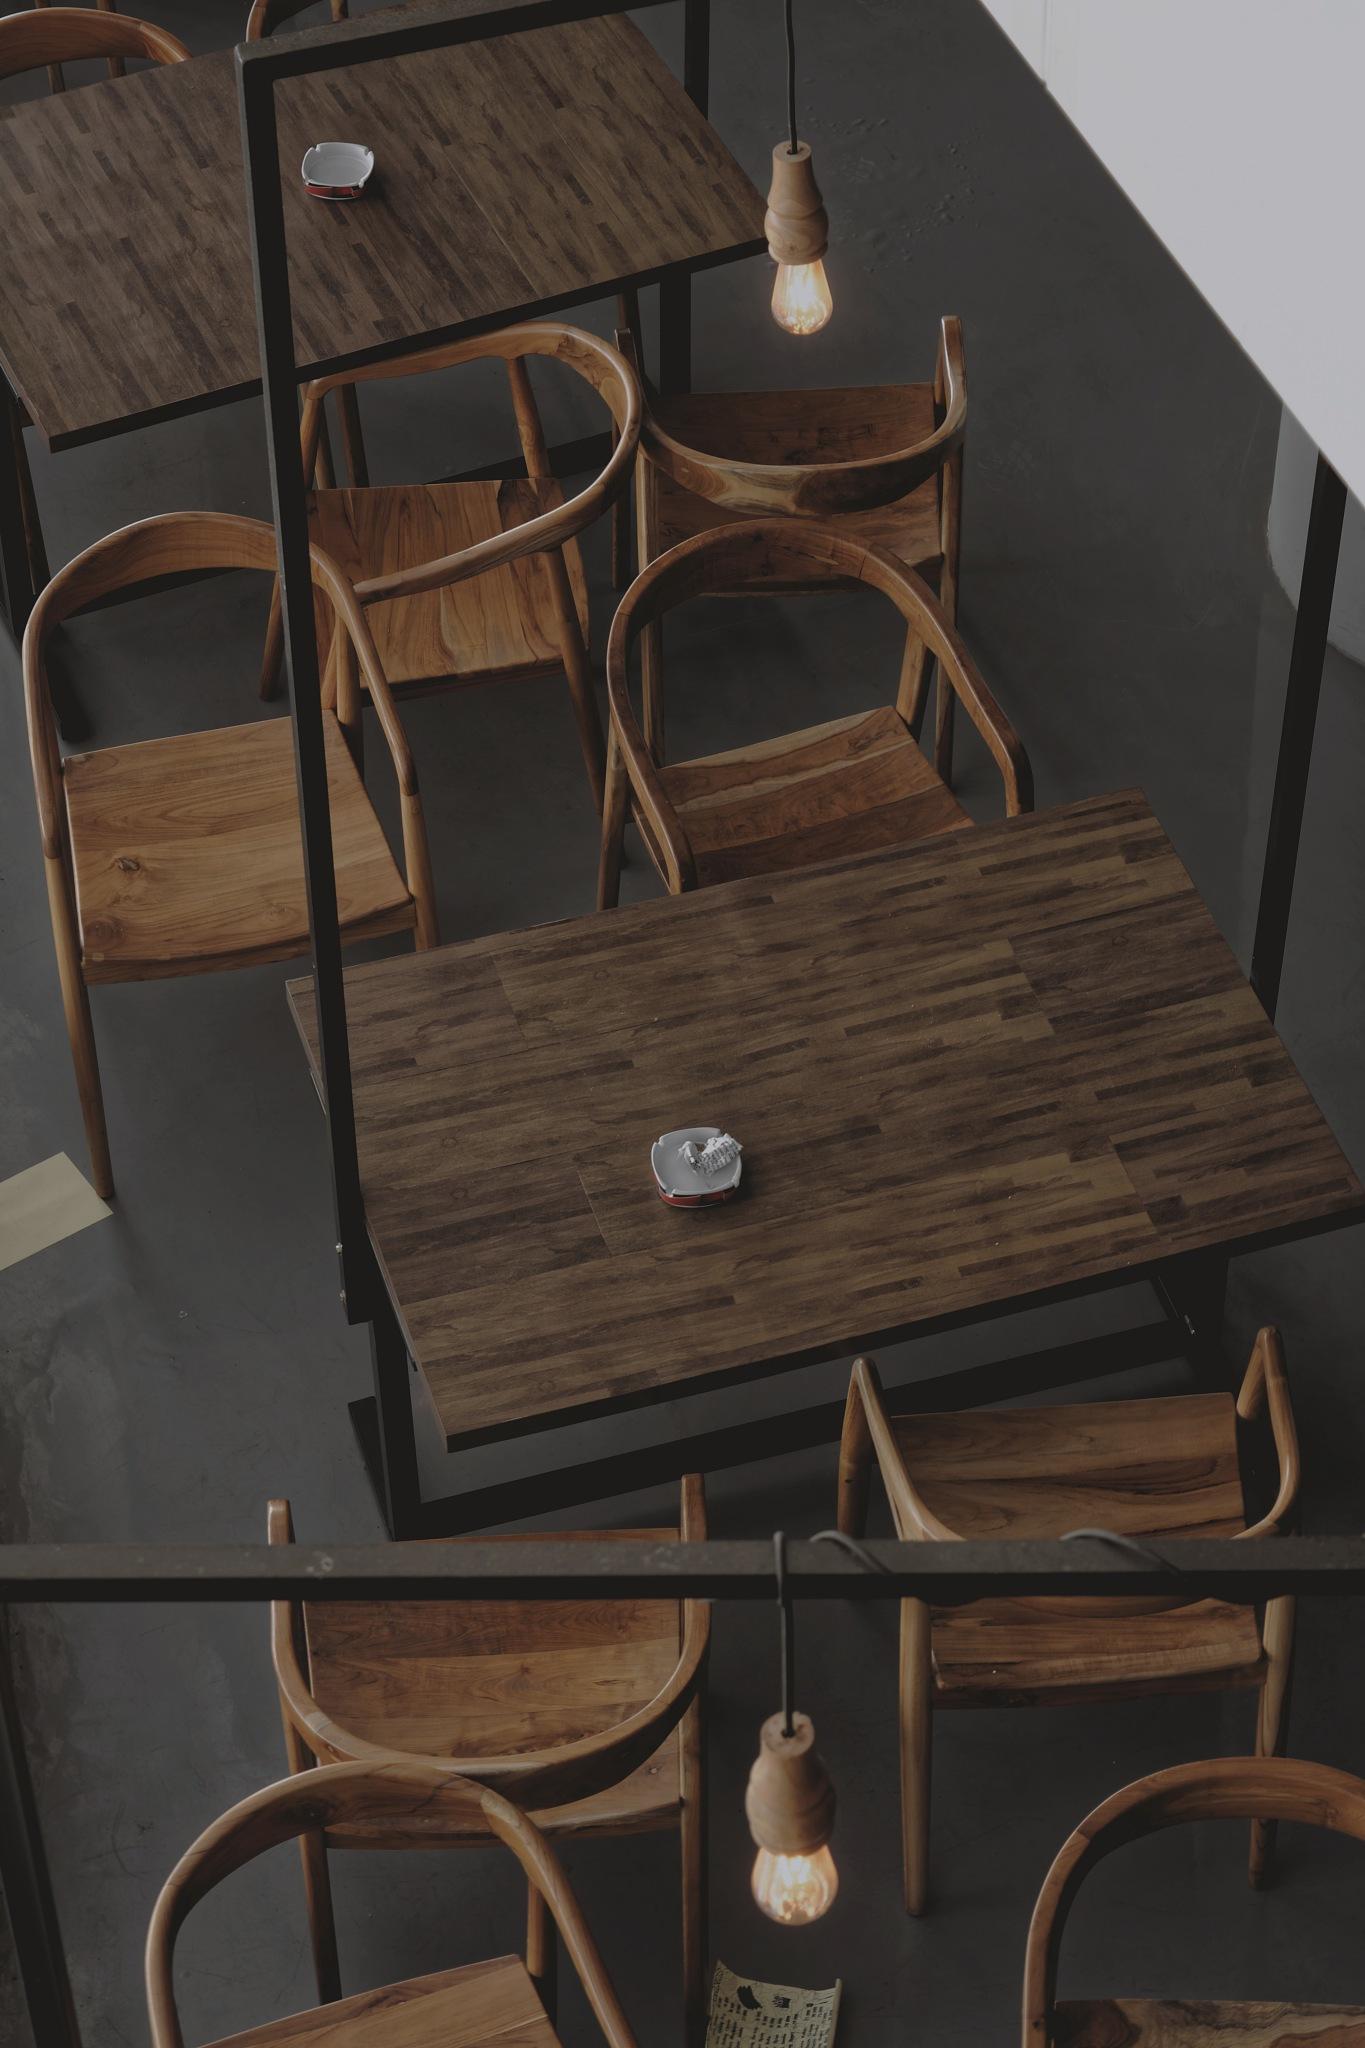 Empty Chair by Budi Selamat